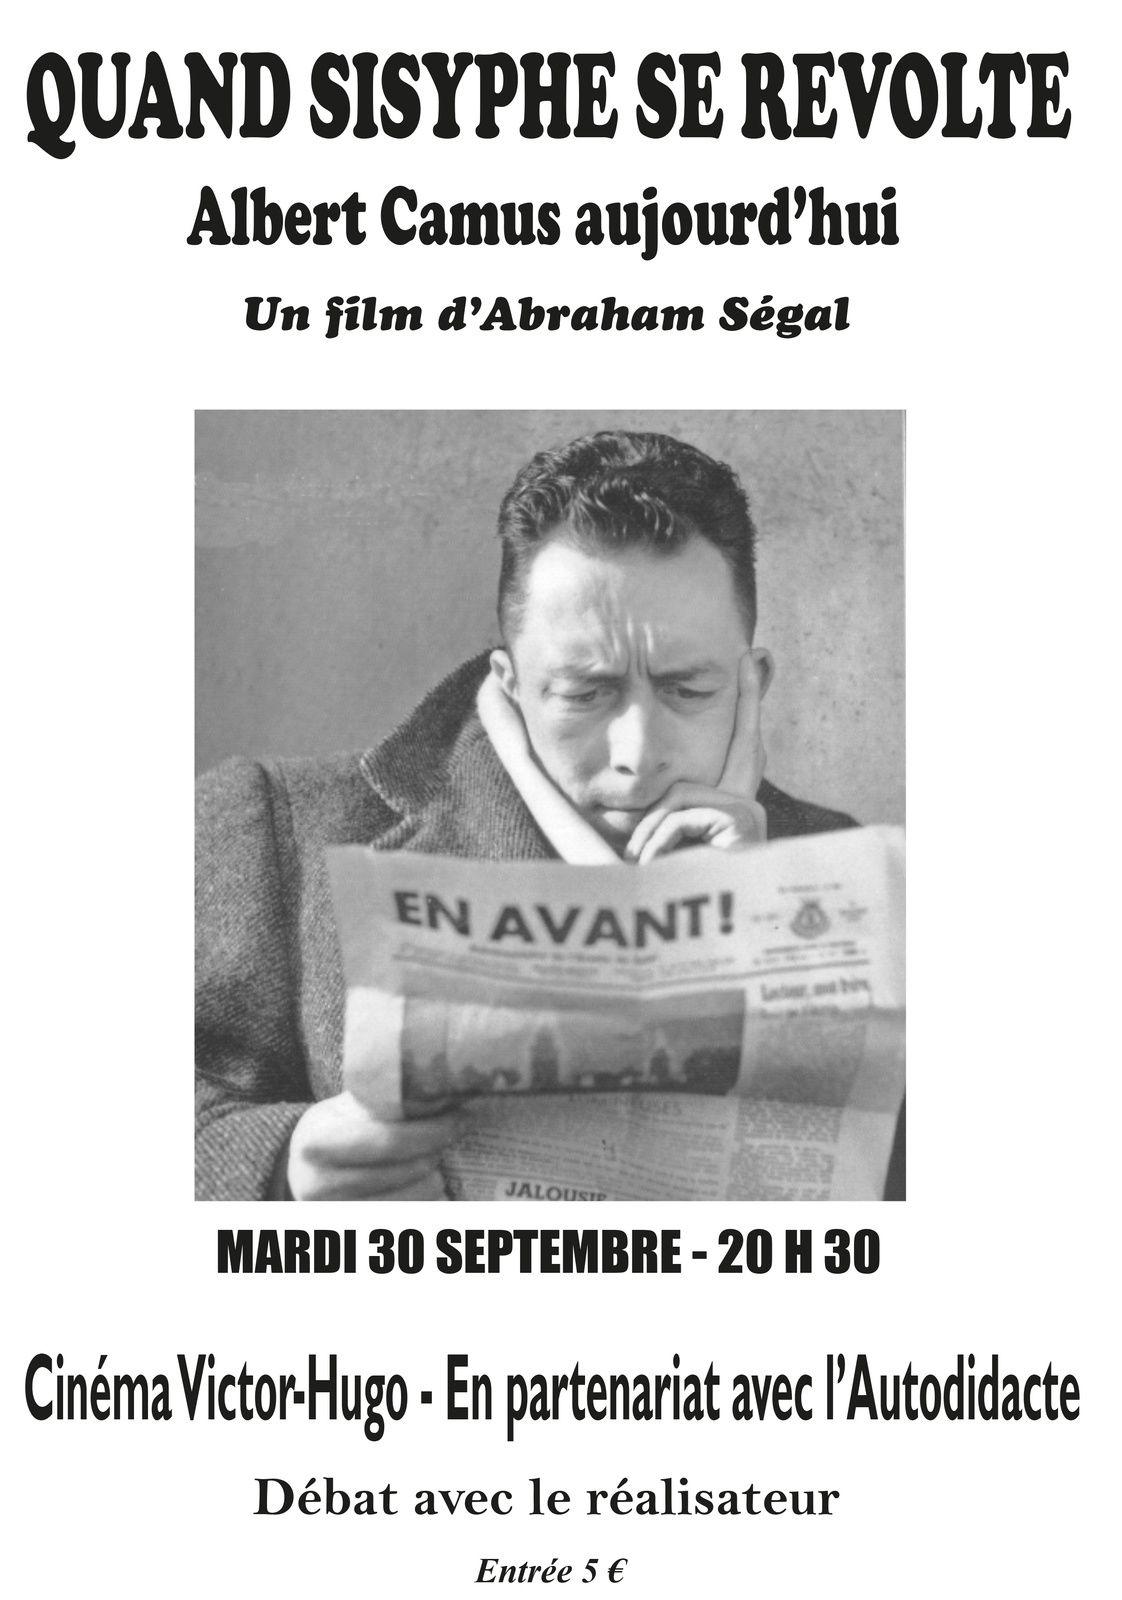 Bientôt à Besançon